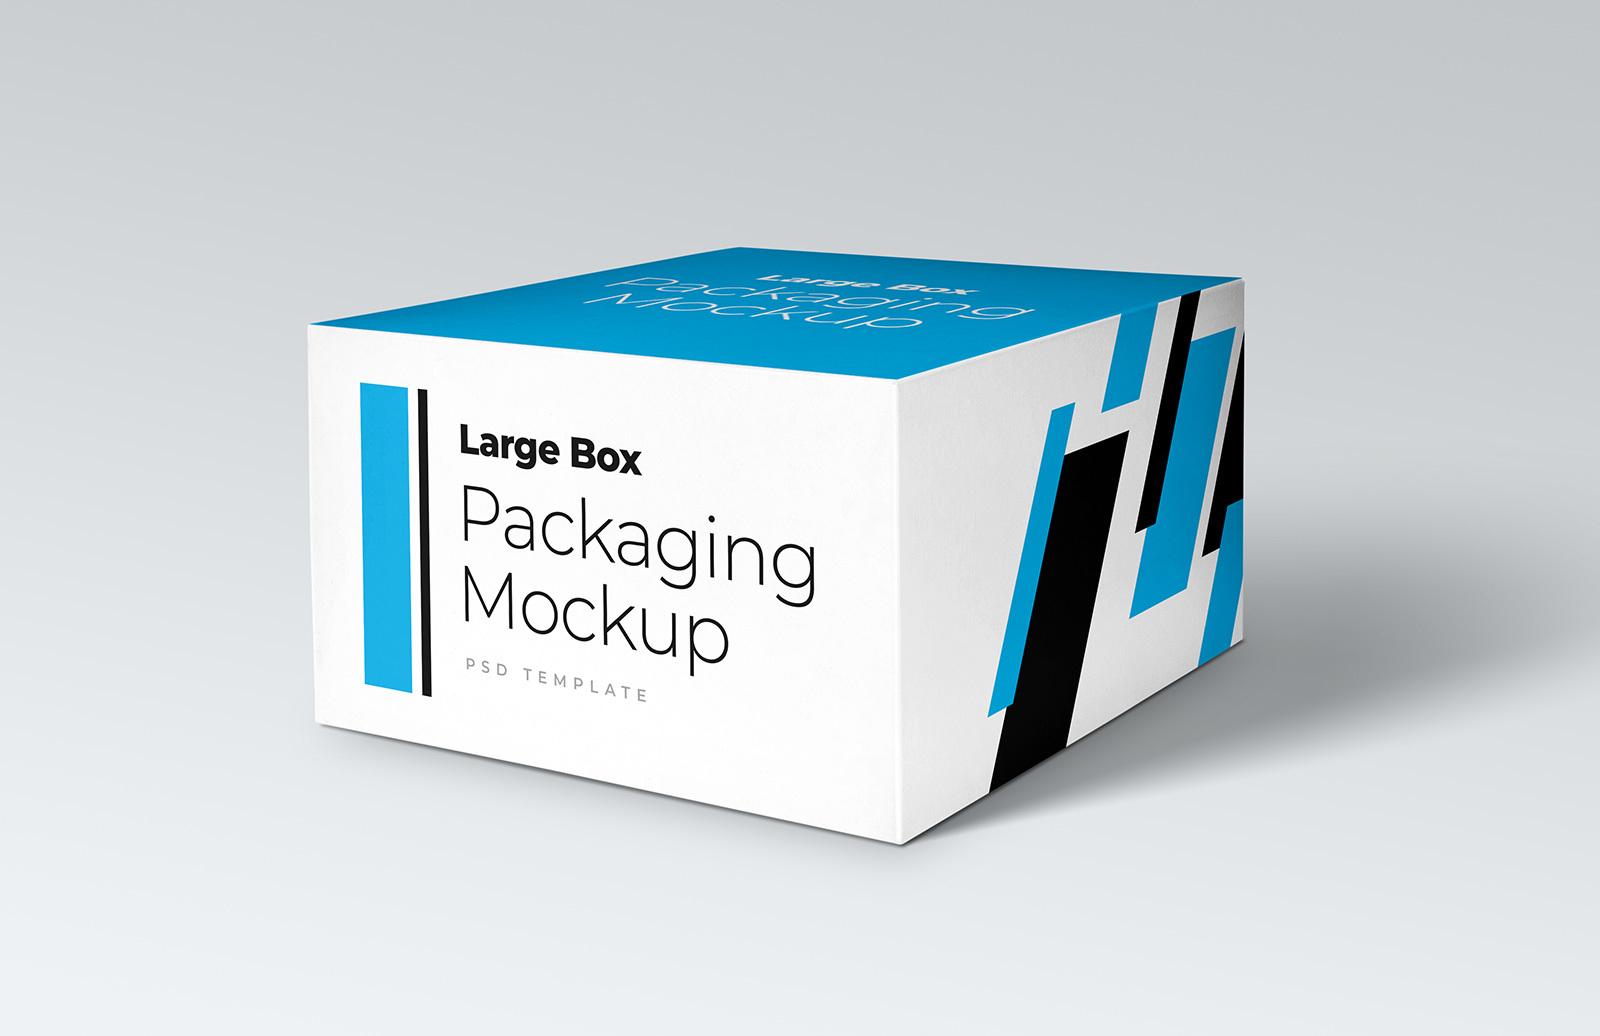 Free Large Box Packaging Mockup